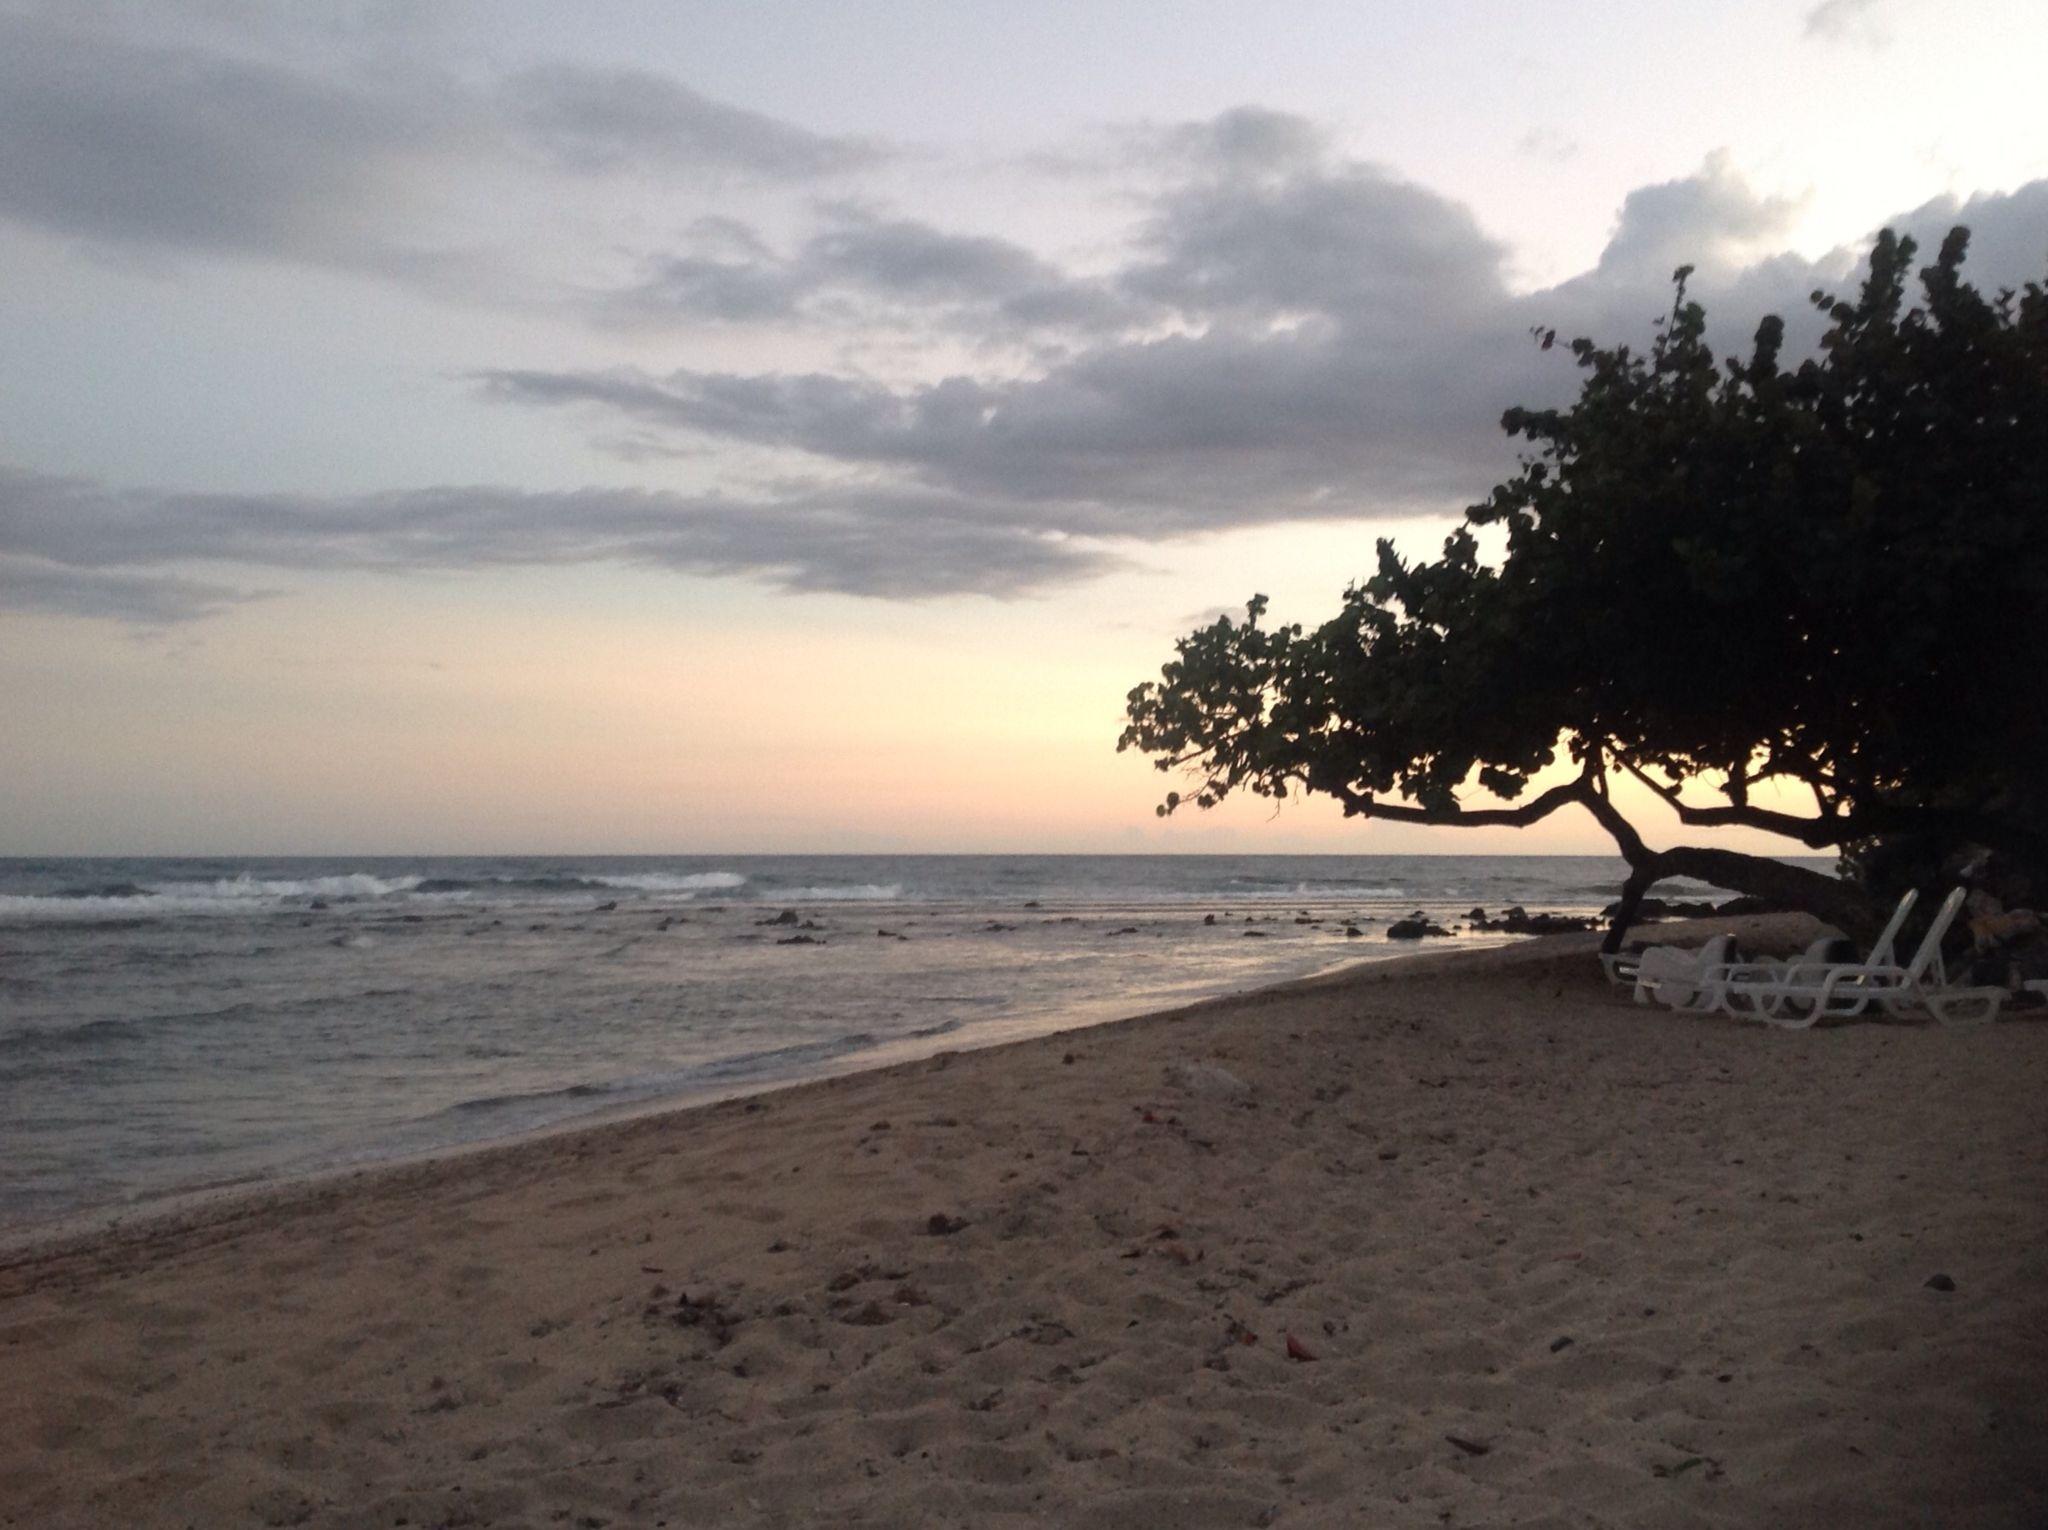 Sunset over Los Galeones beach!